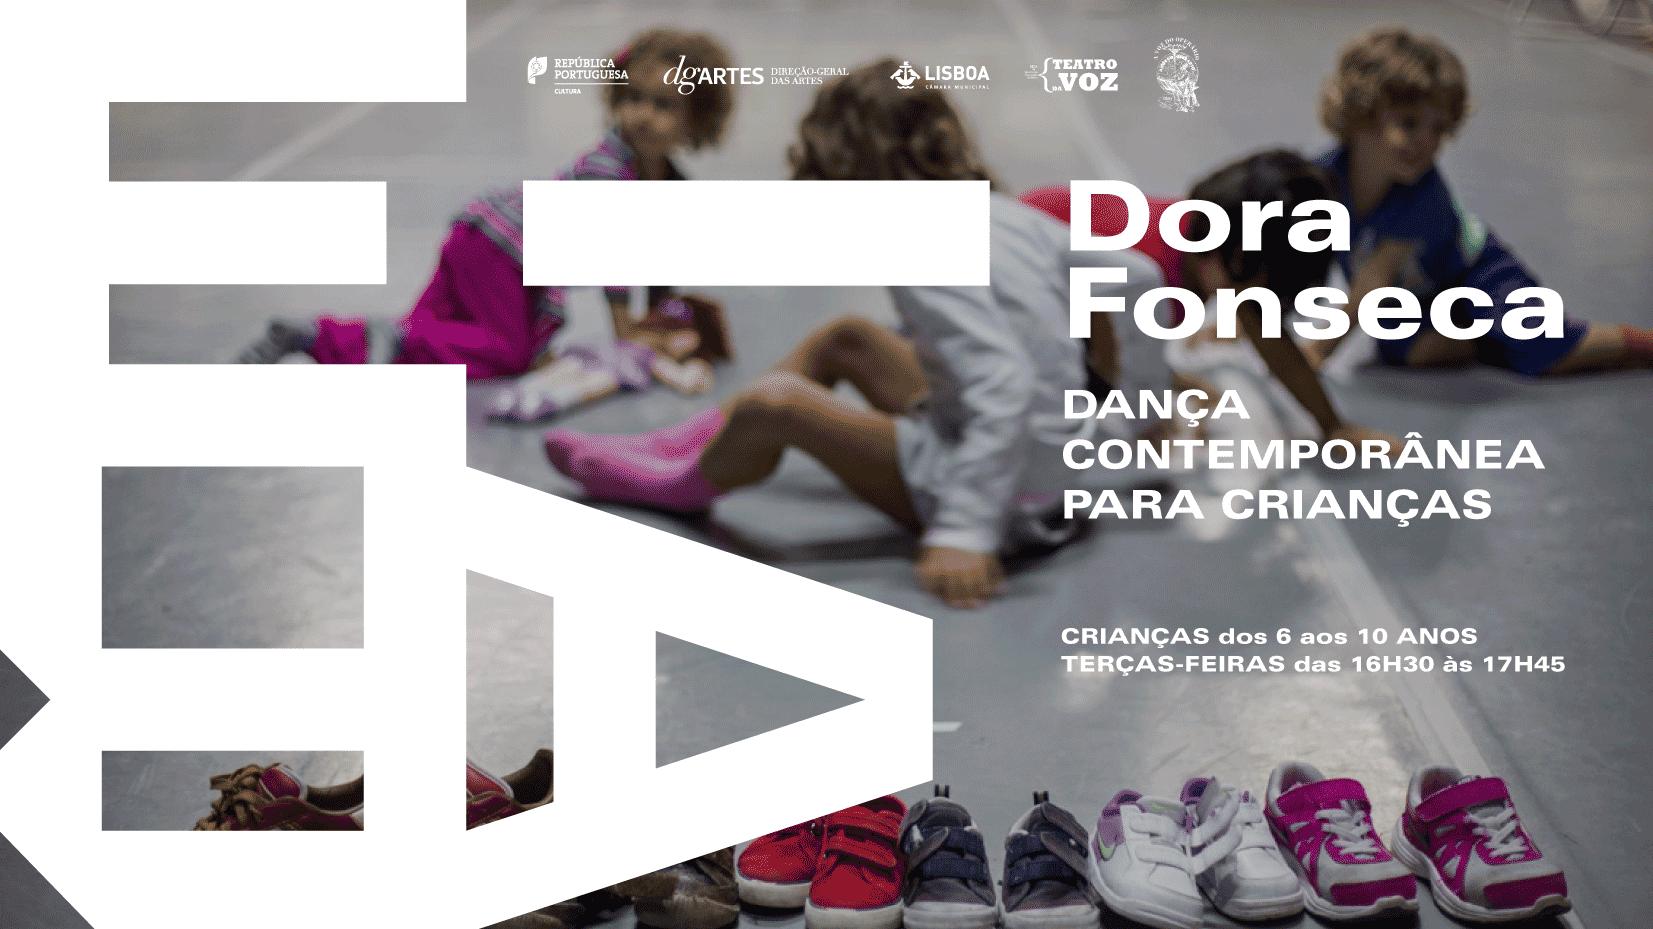 CoverFB_DoraFonseca